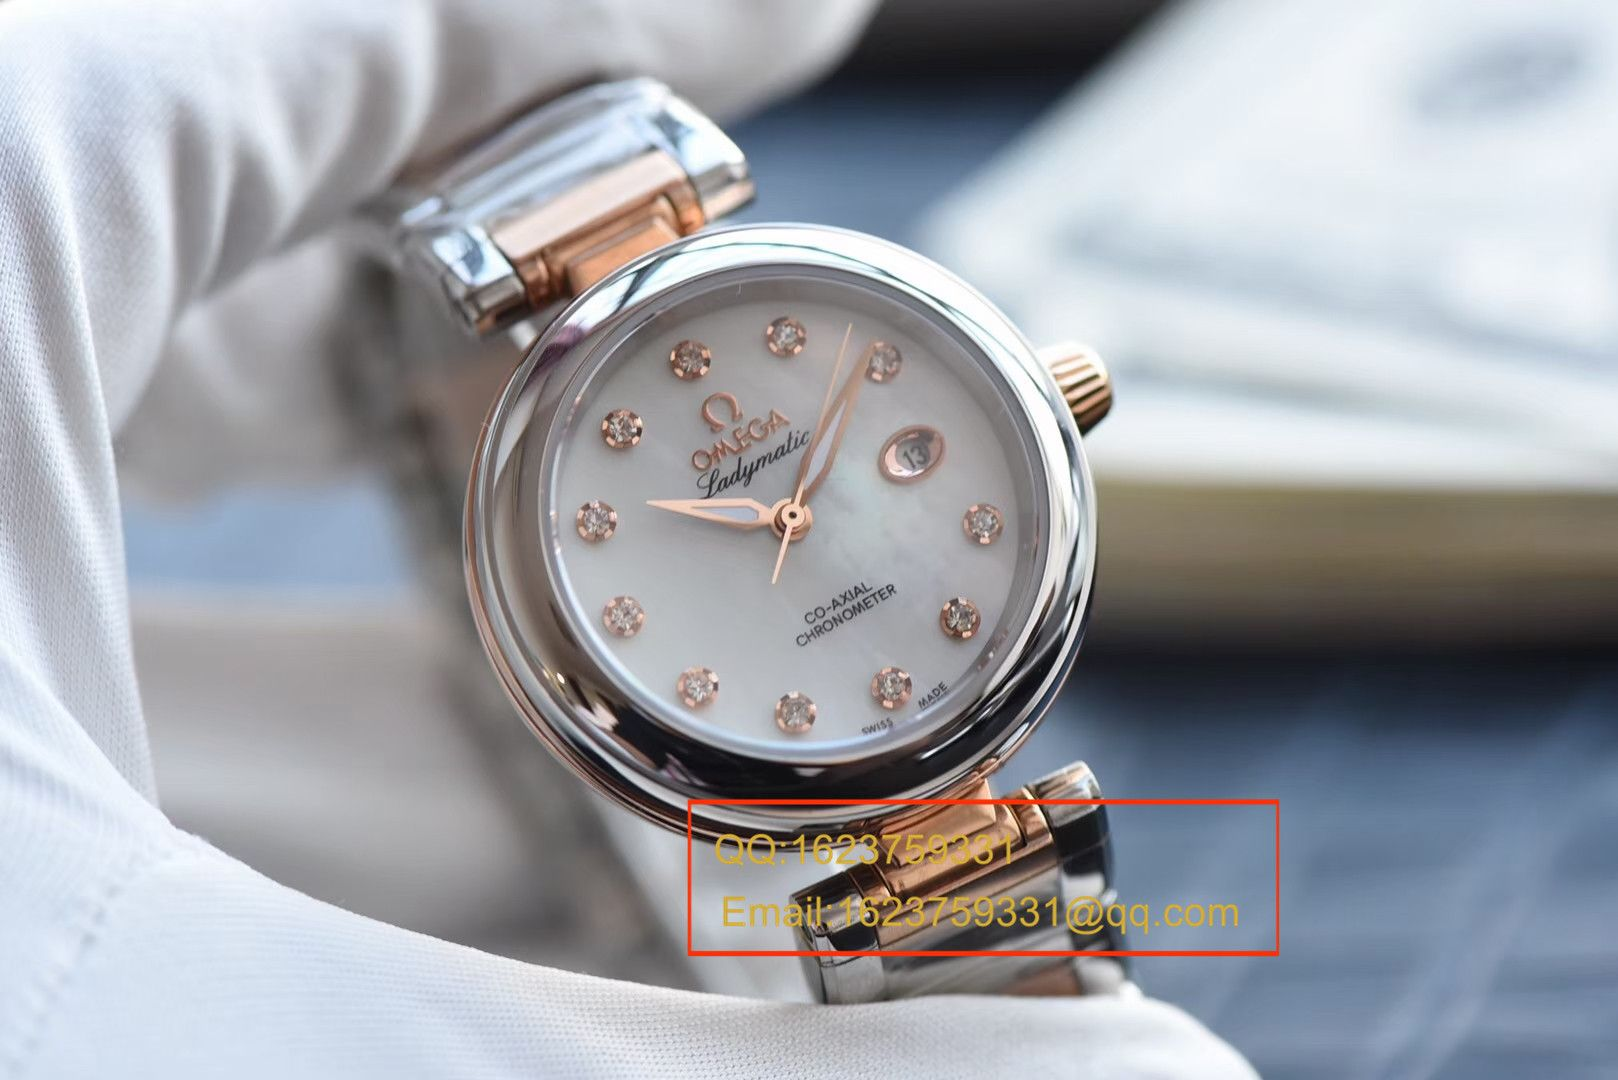 【HBBV6一比一超A精仿手表】最高版本欧米茄碟飞鸟巢系列425.20.34.20.55.004女士手表腕表